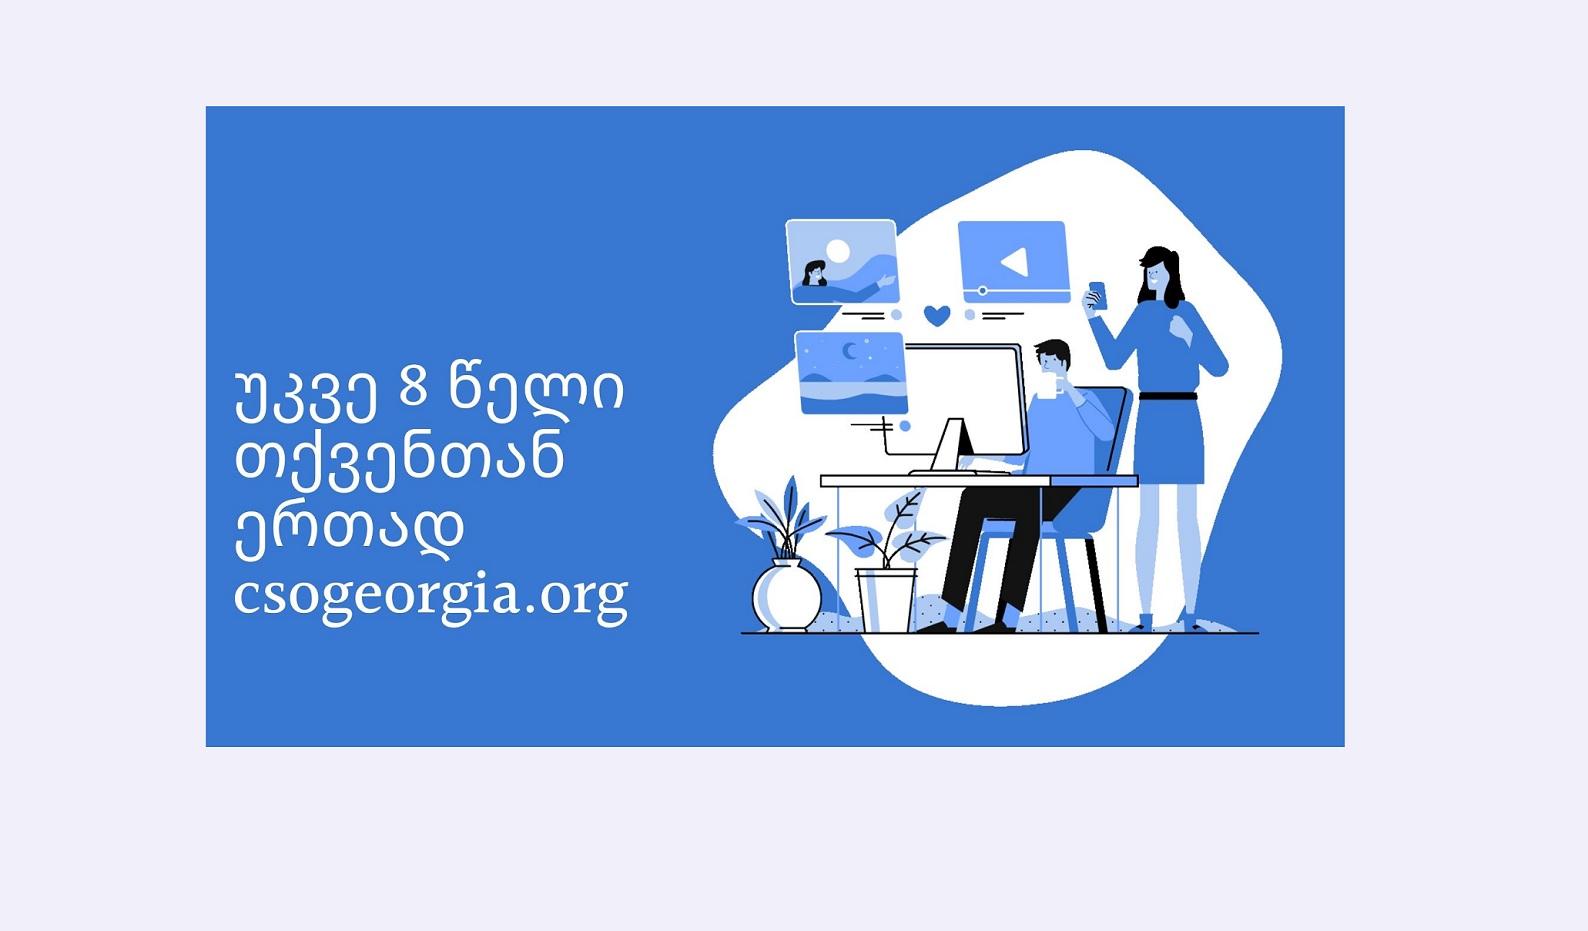 Csogeorgia.org 8 წლისაა